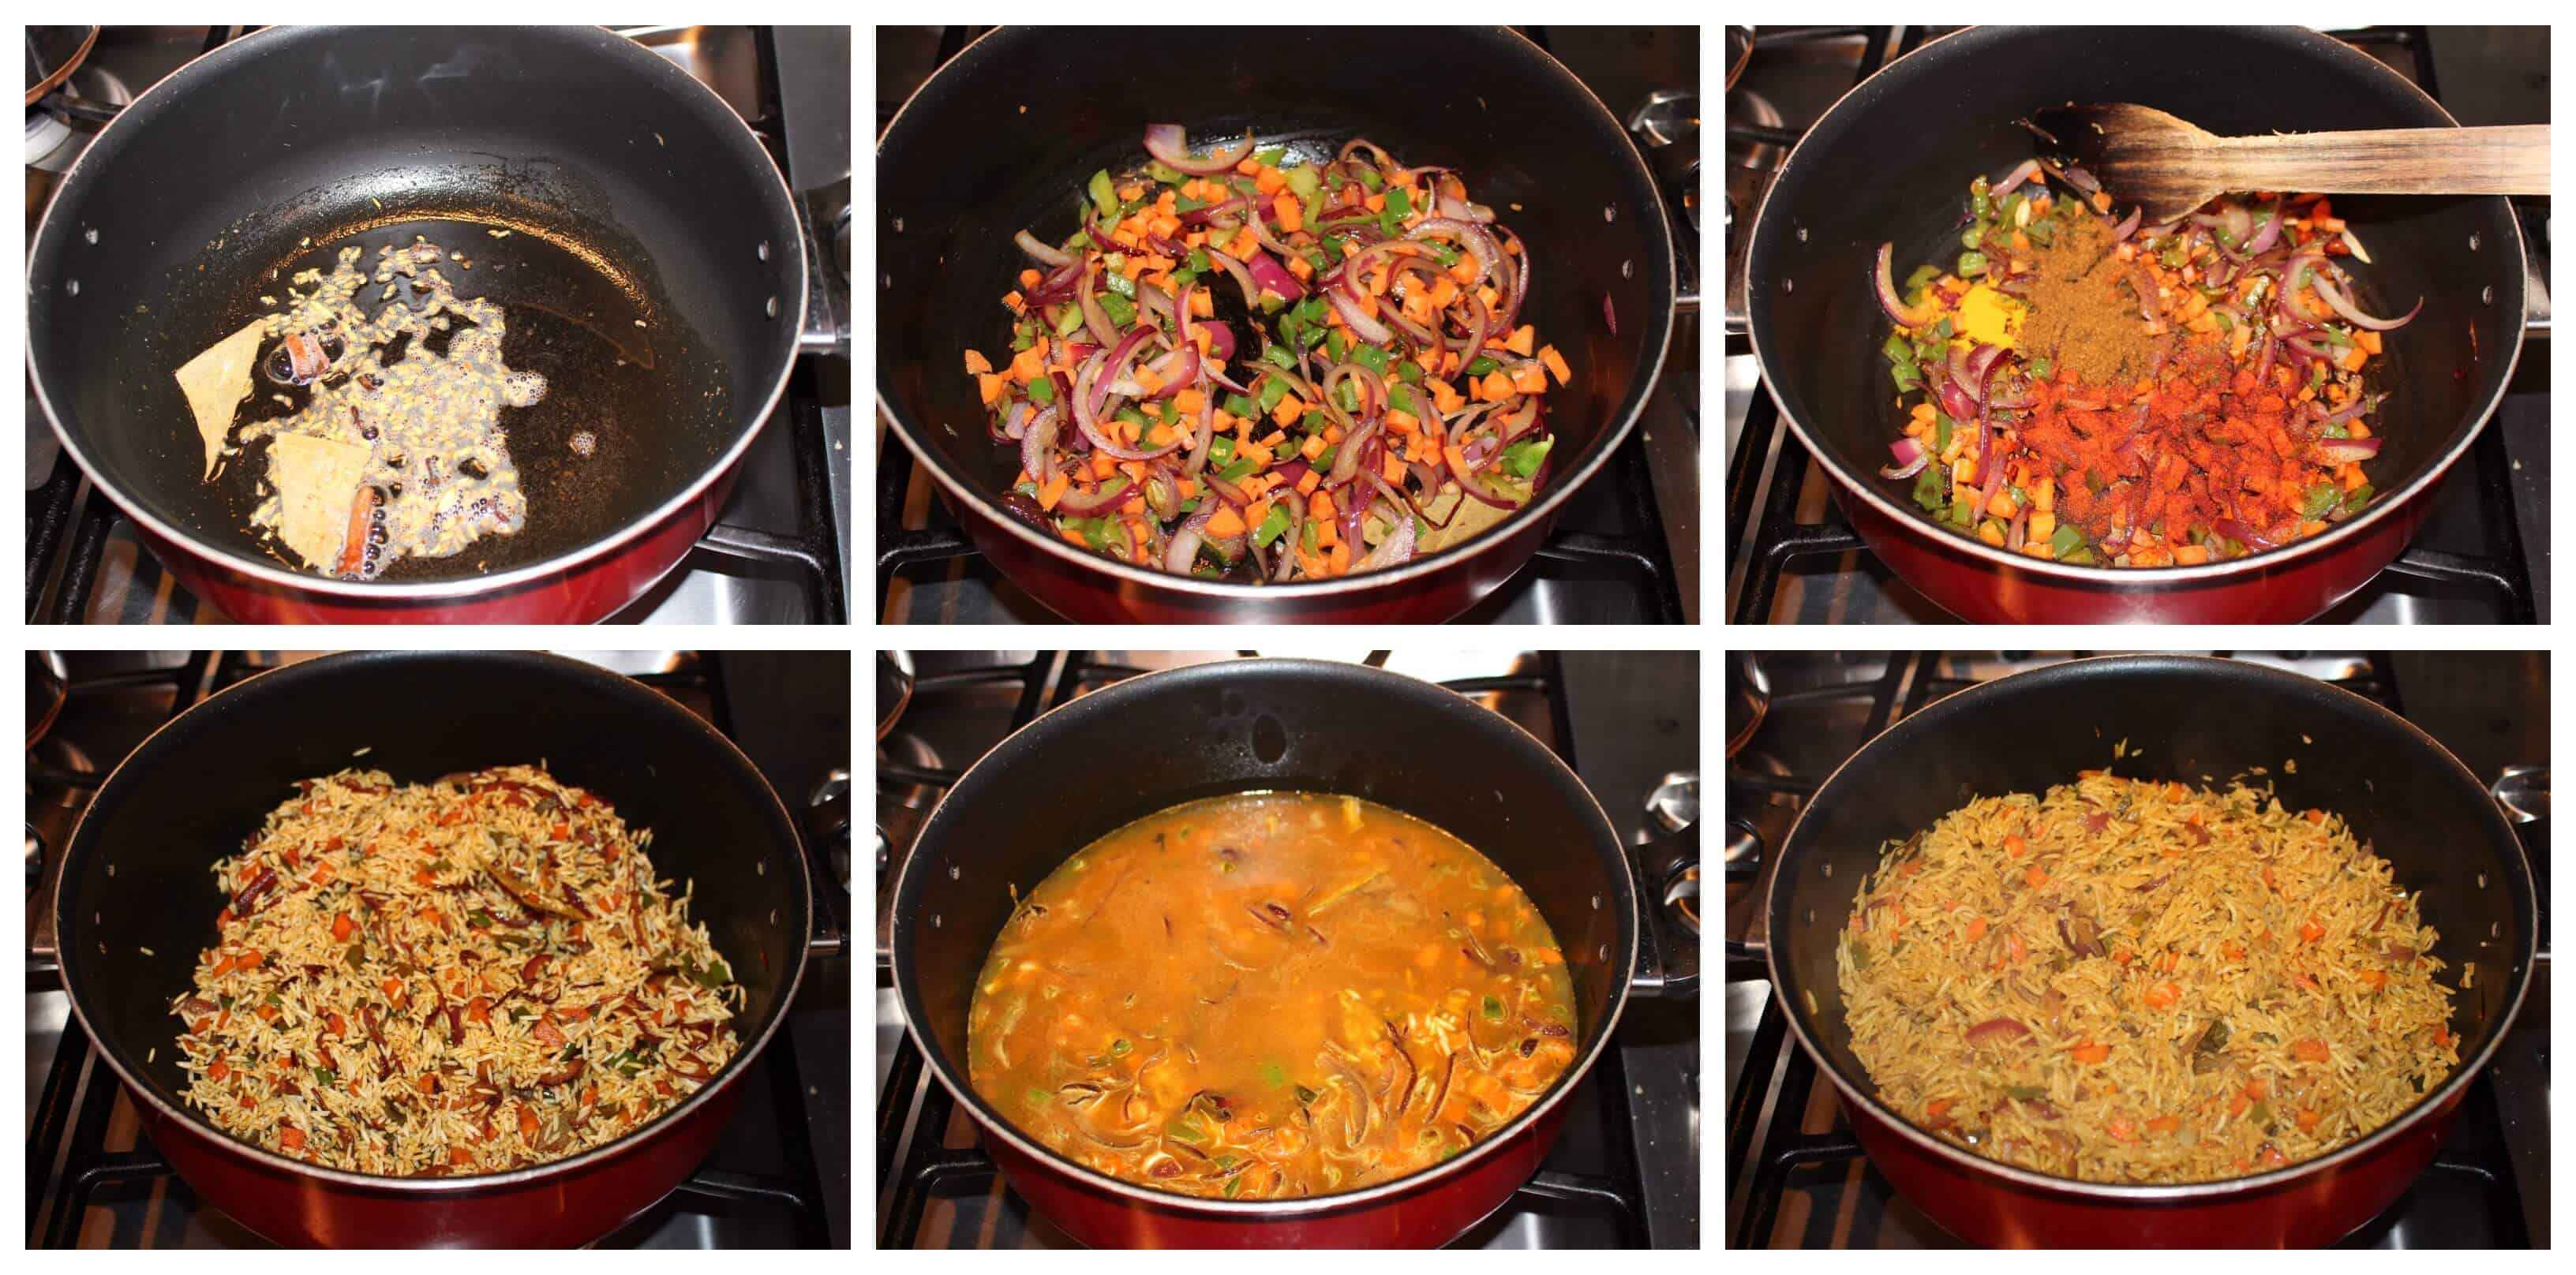 Step by step method to make Vegetable Biriyani